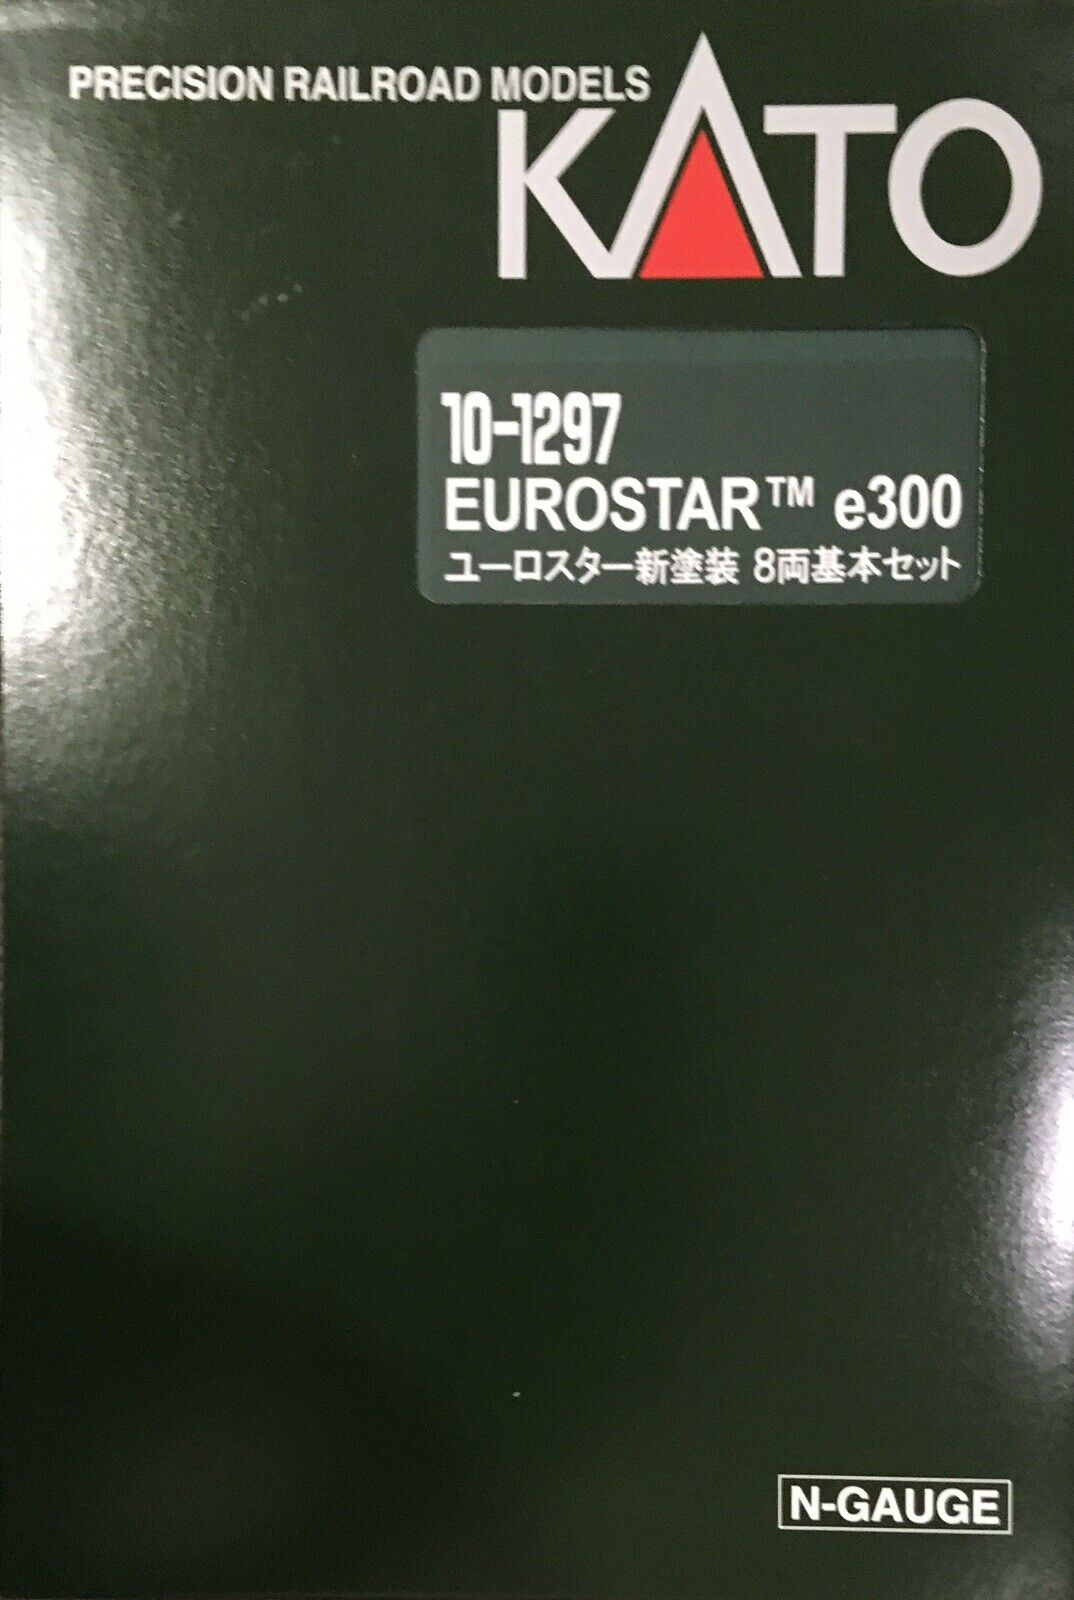 NEU  EUROSTAR e300 - Kato 10-1297 - 8tlg. Set - Spur N